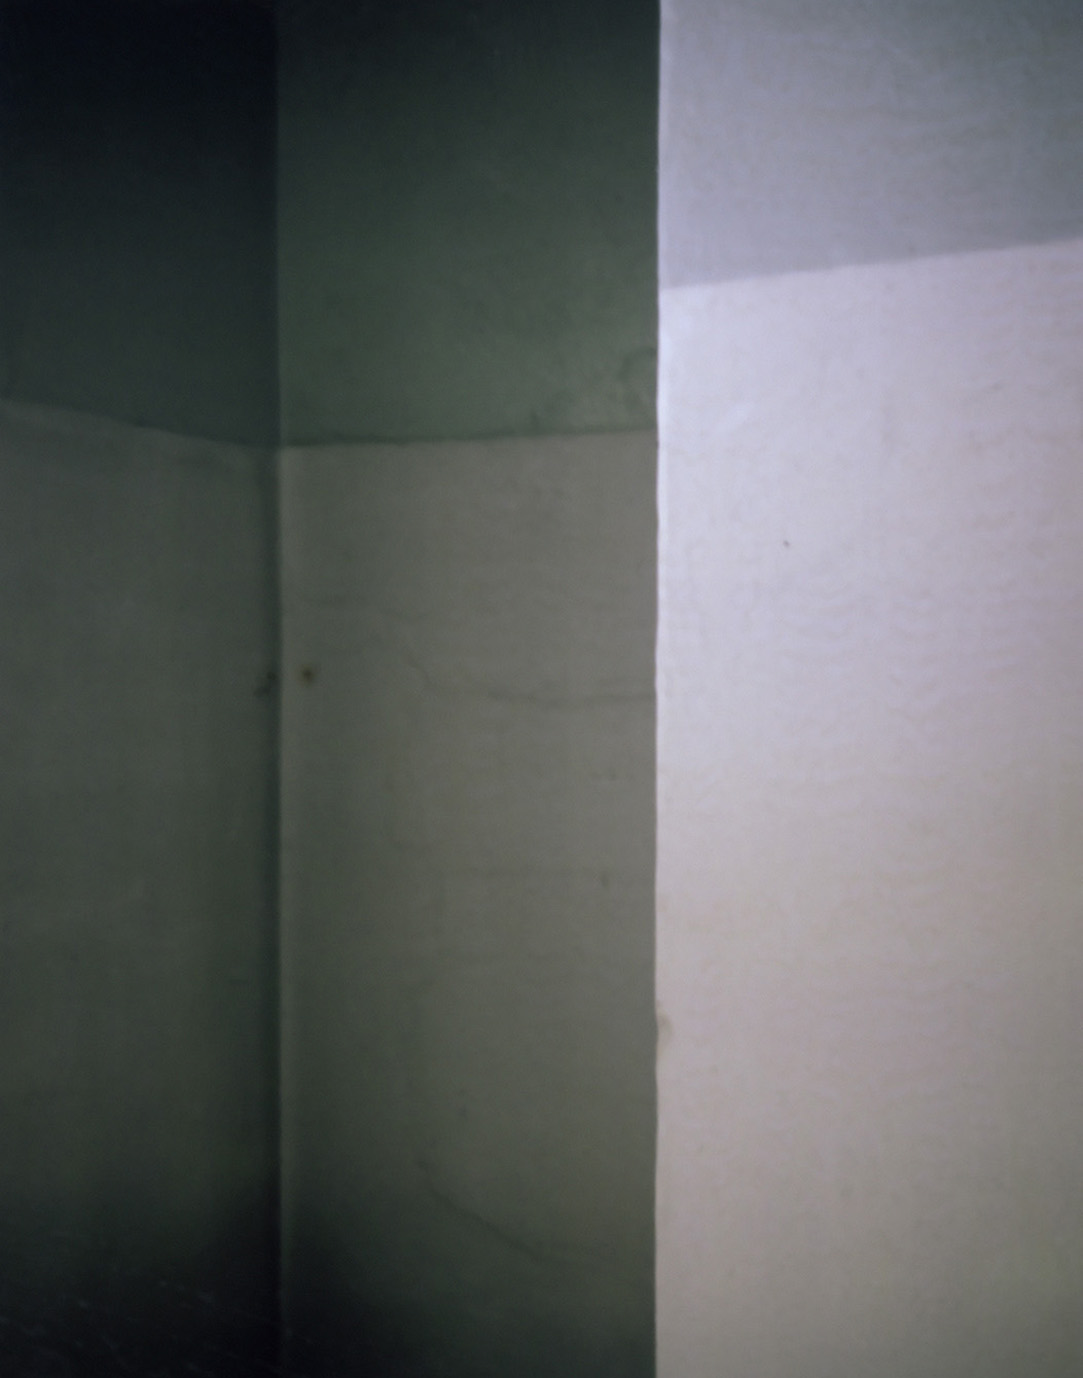 006t.jpg